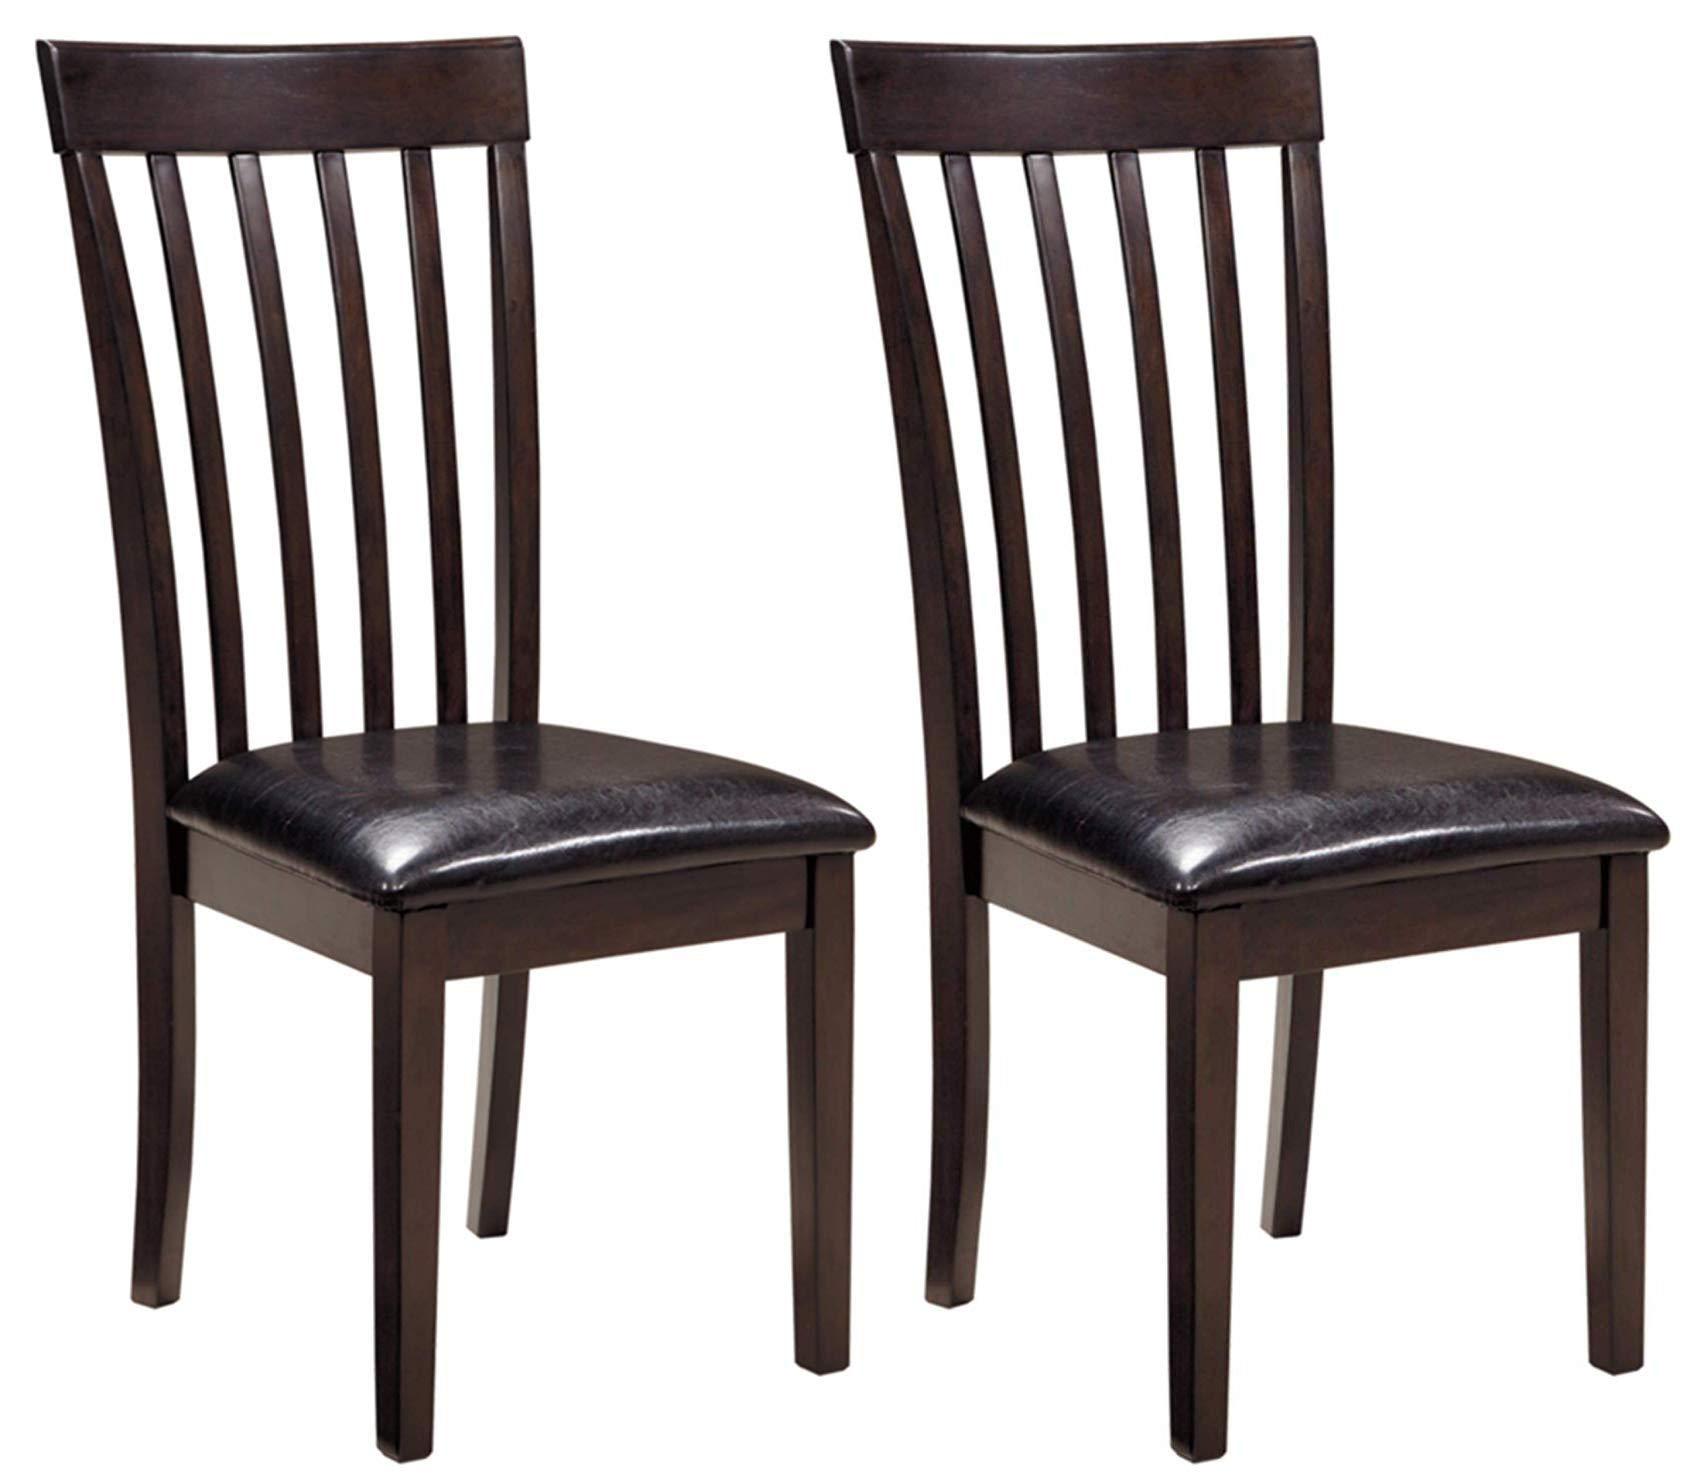 Ashley Furniture Signature Design - Hammis Dining Room Chair - Contemporary - Set of 2 - Dark Brown